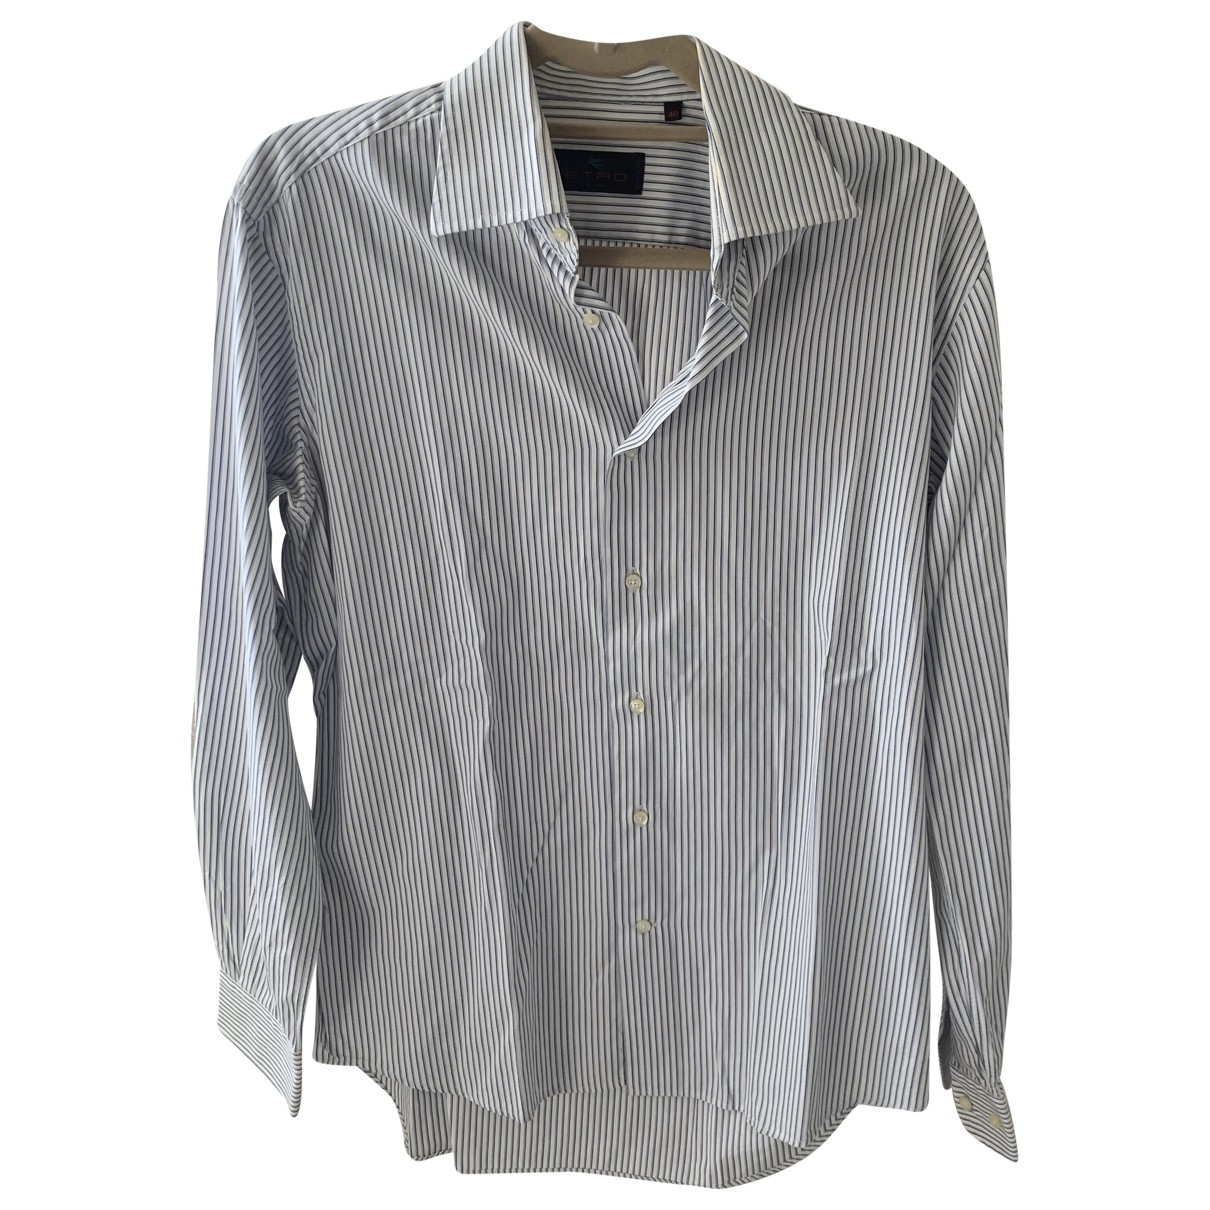 Etro \N Blue Cotton Shirts for Men 40 EU (tour de cou / collar)